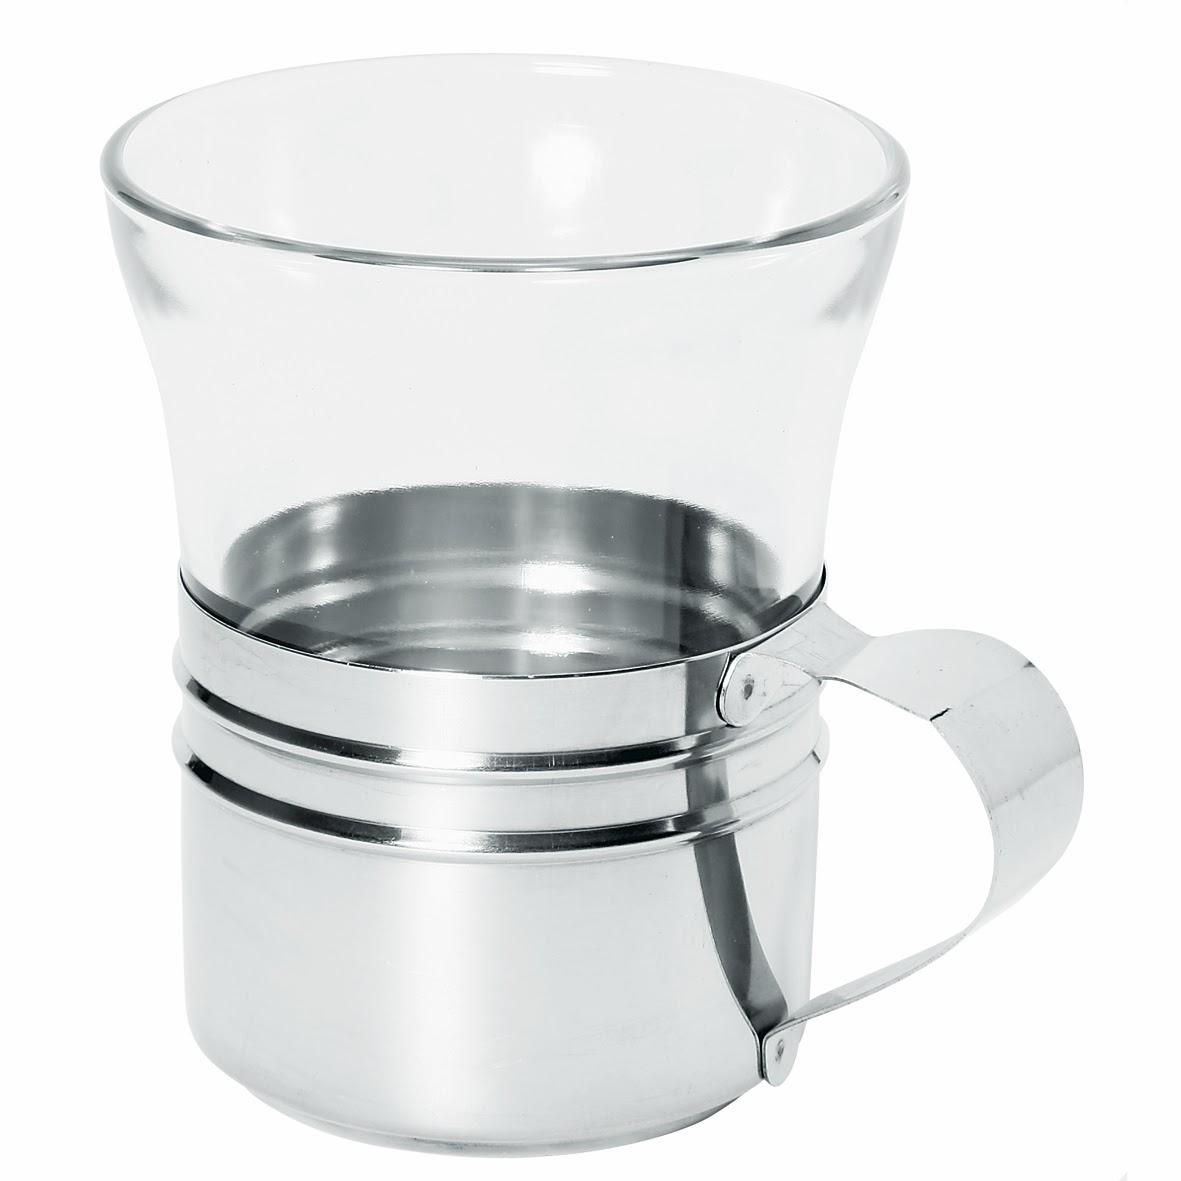 Pahar de Ceai din Sticla cu Maner din Inox, Pahar Termorezistent, Profesional Horeca Import Olanda, www.amenajarihoreca.ro